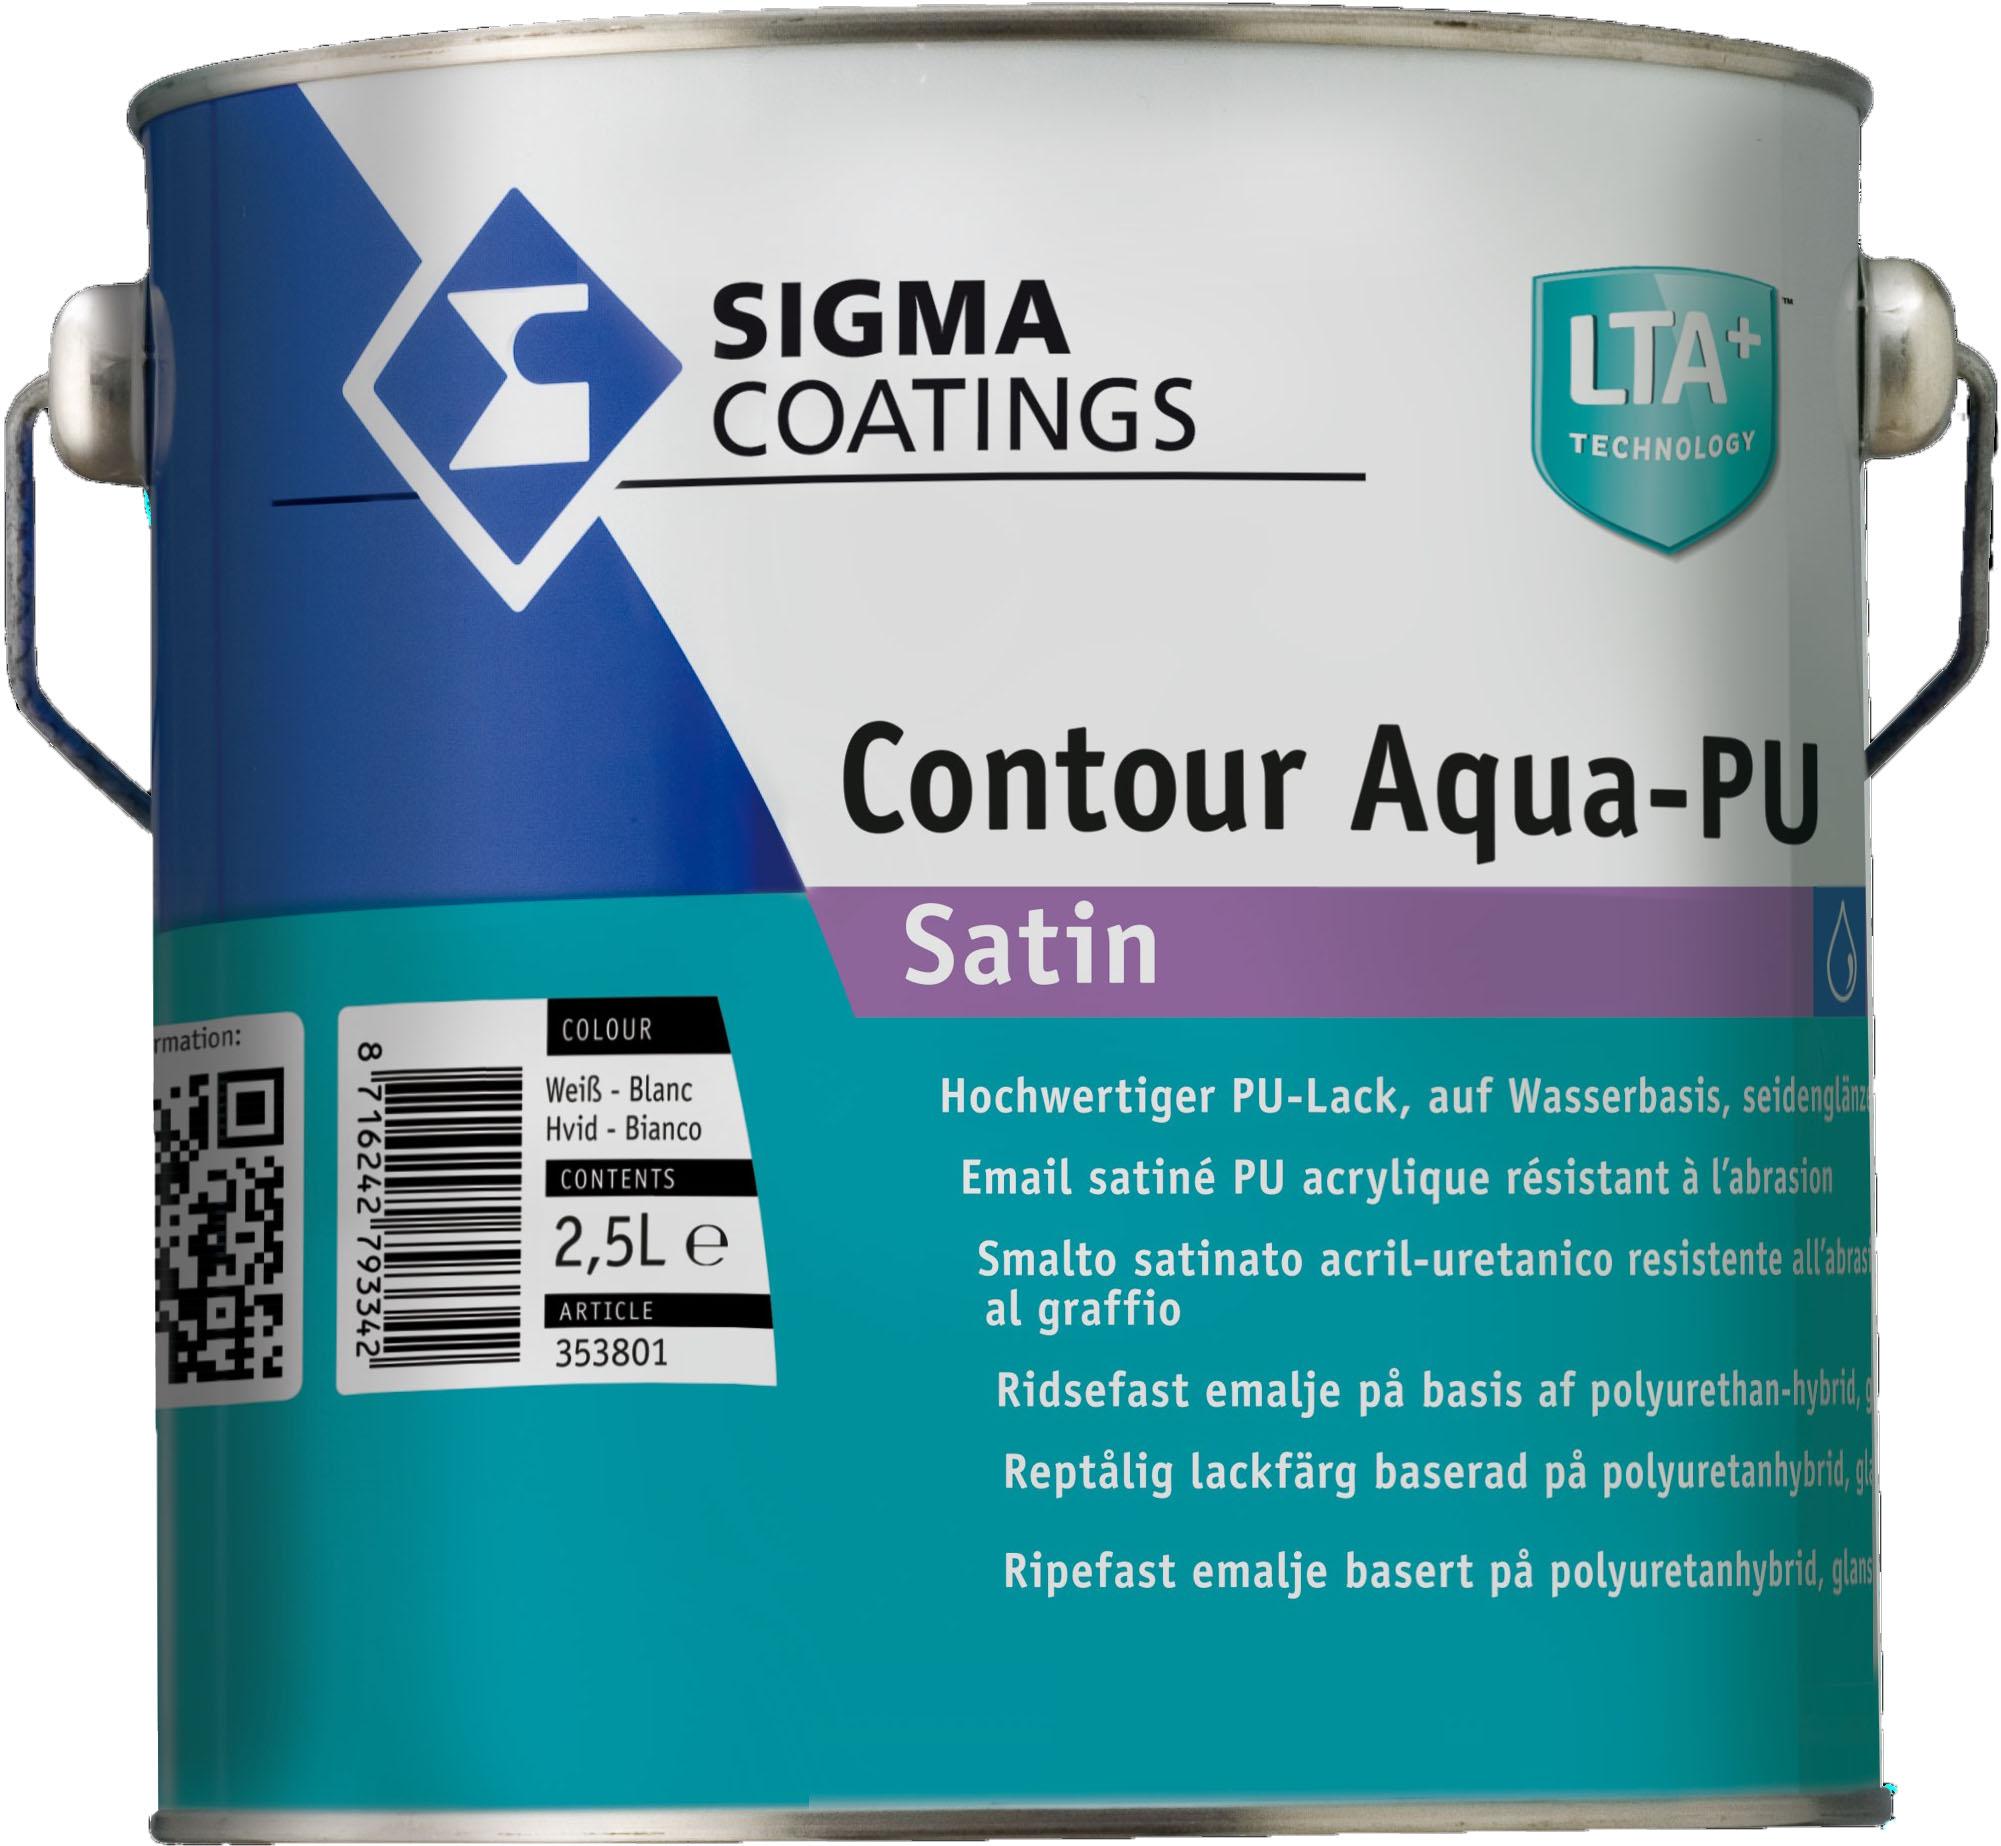 Contour Aqua PU Satin